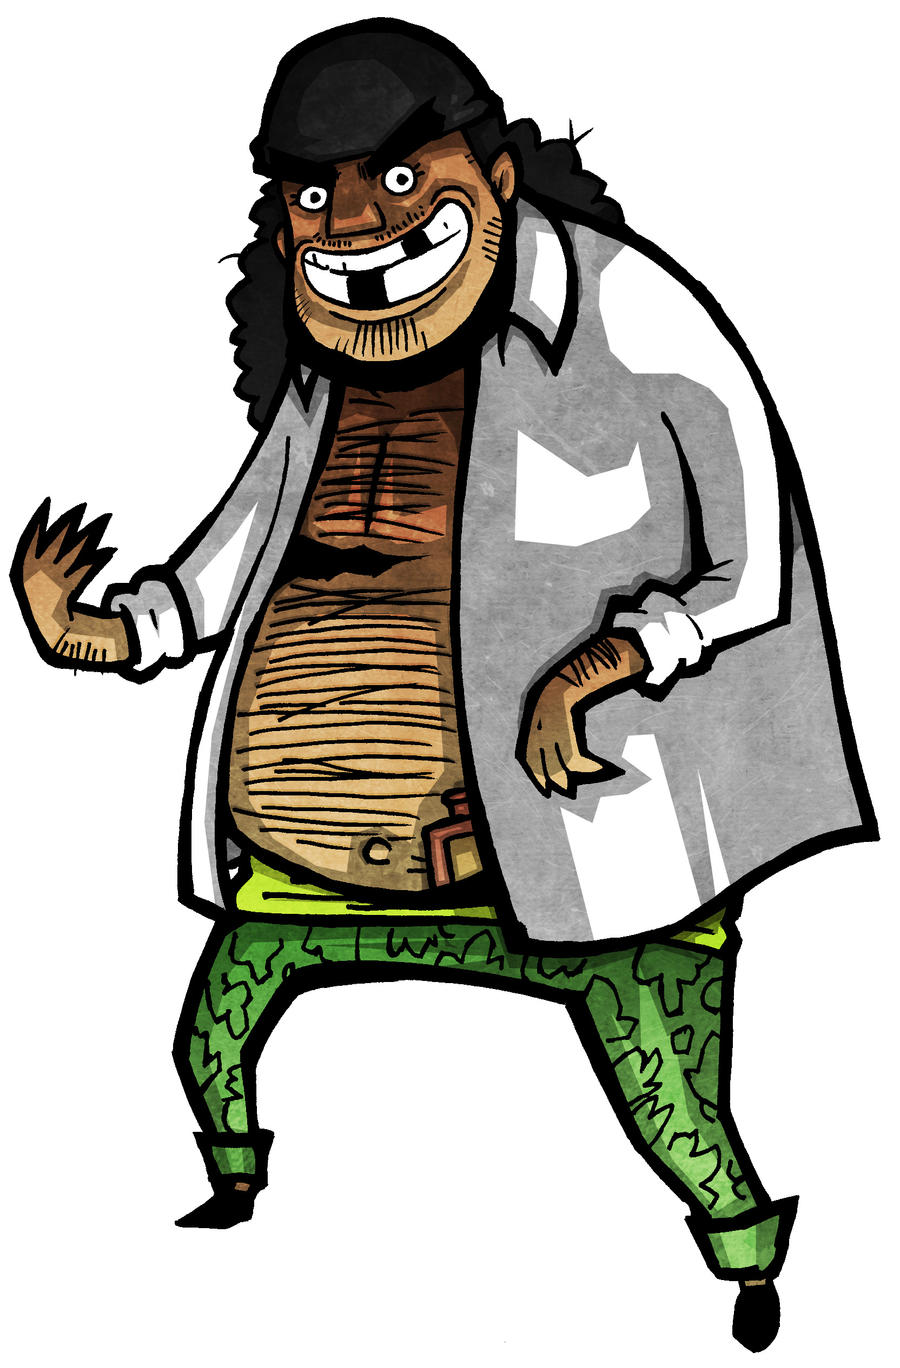 One Piece - Blackbeard by Hanogan on DeviantArt